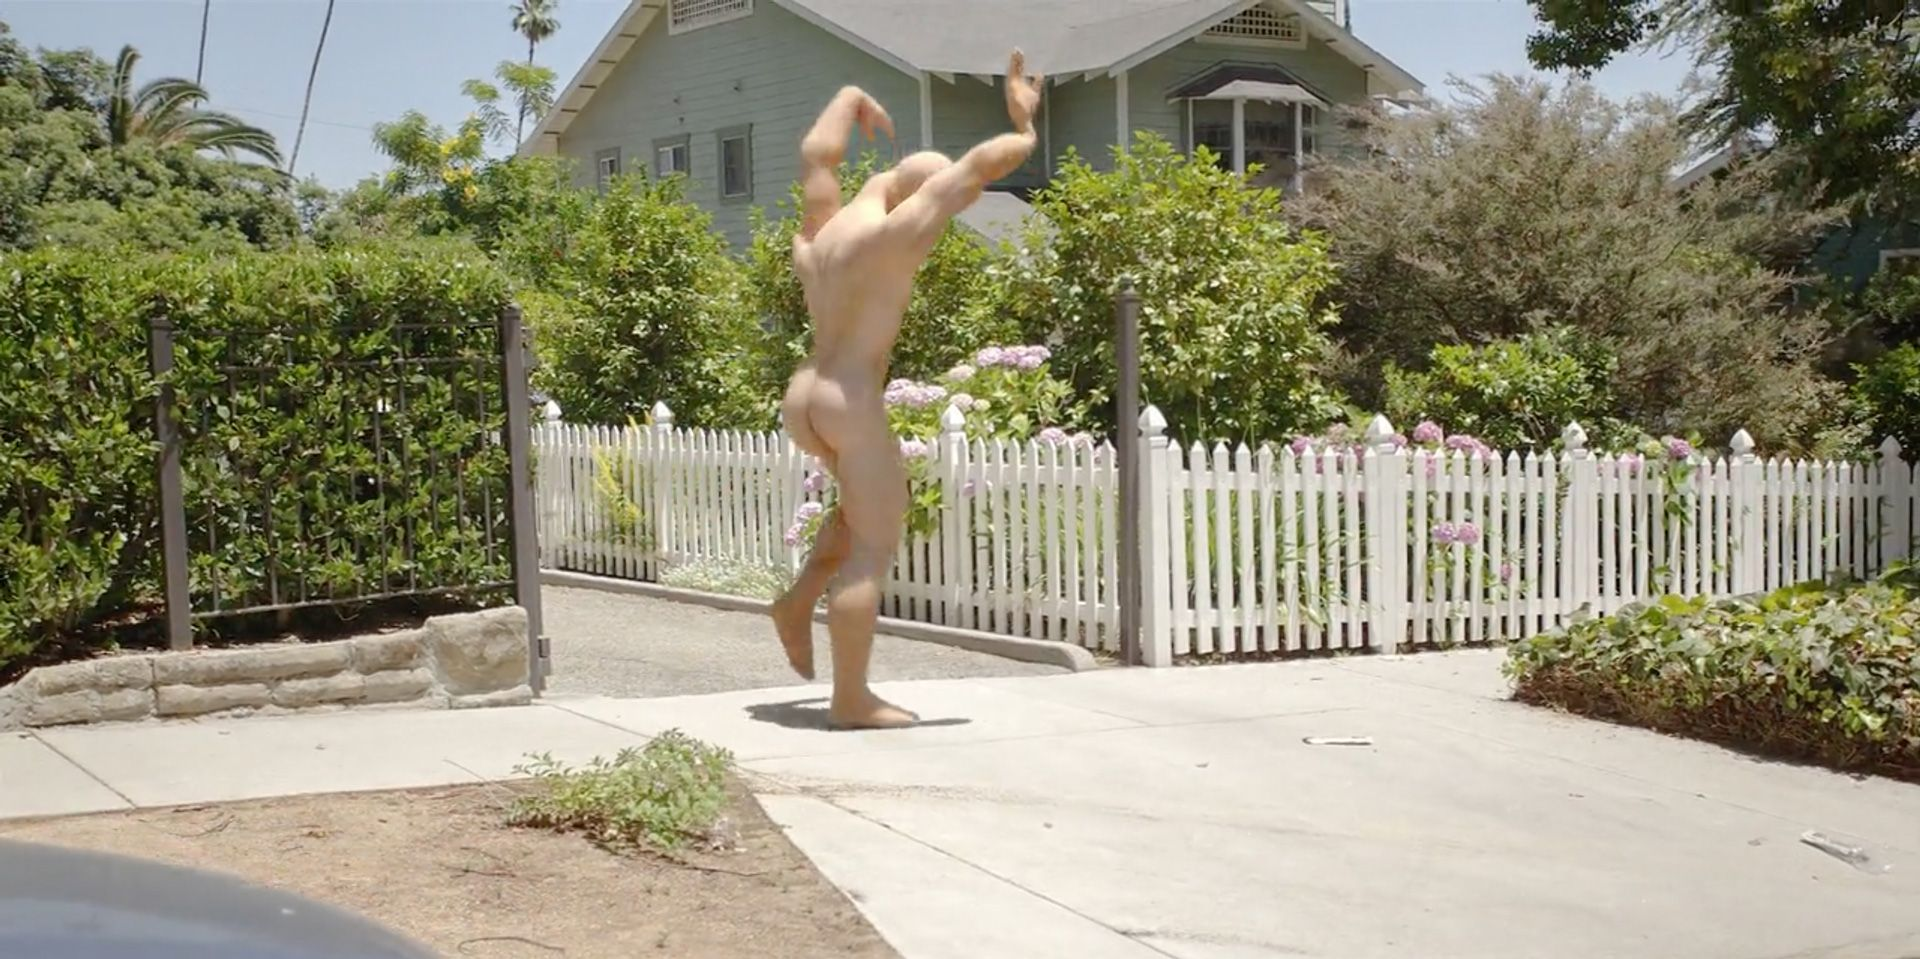 short film called Late for Meeting by David Lewanski